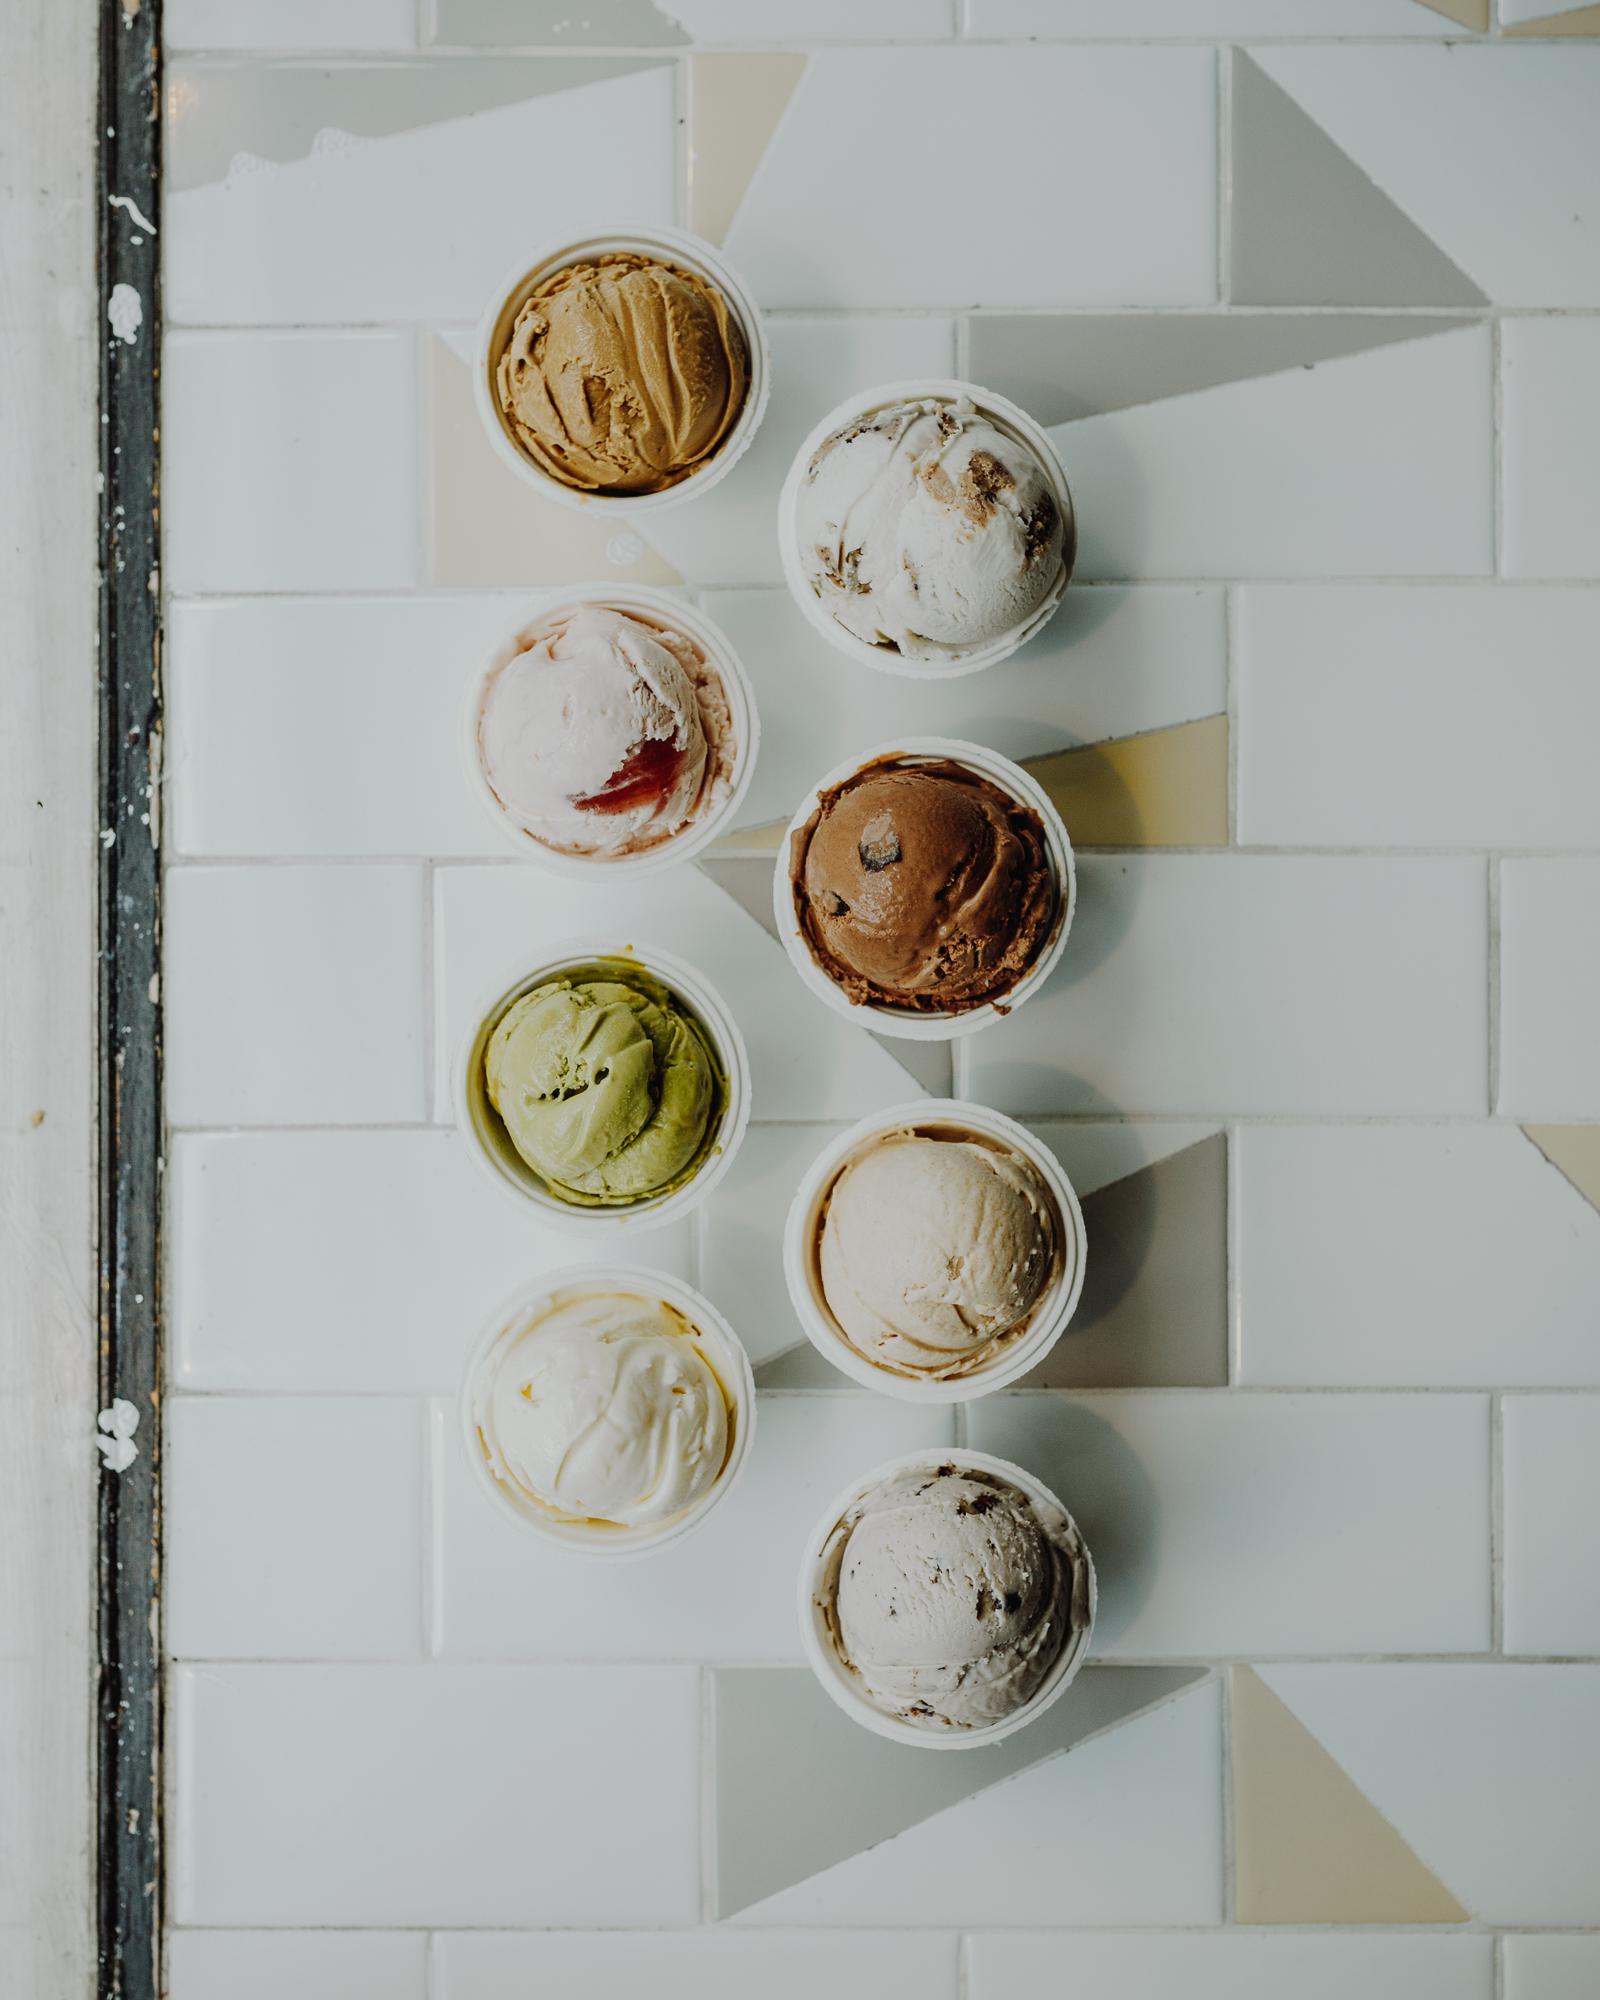 Vegan Ice Cream Crown Heights